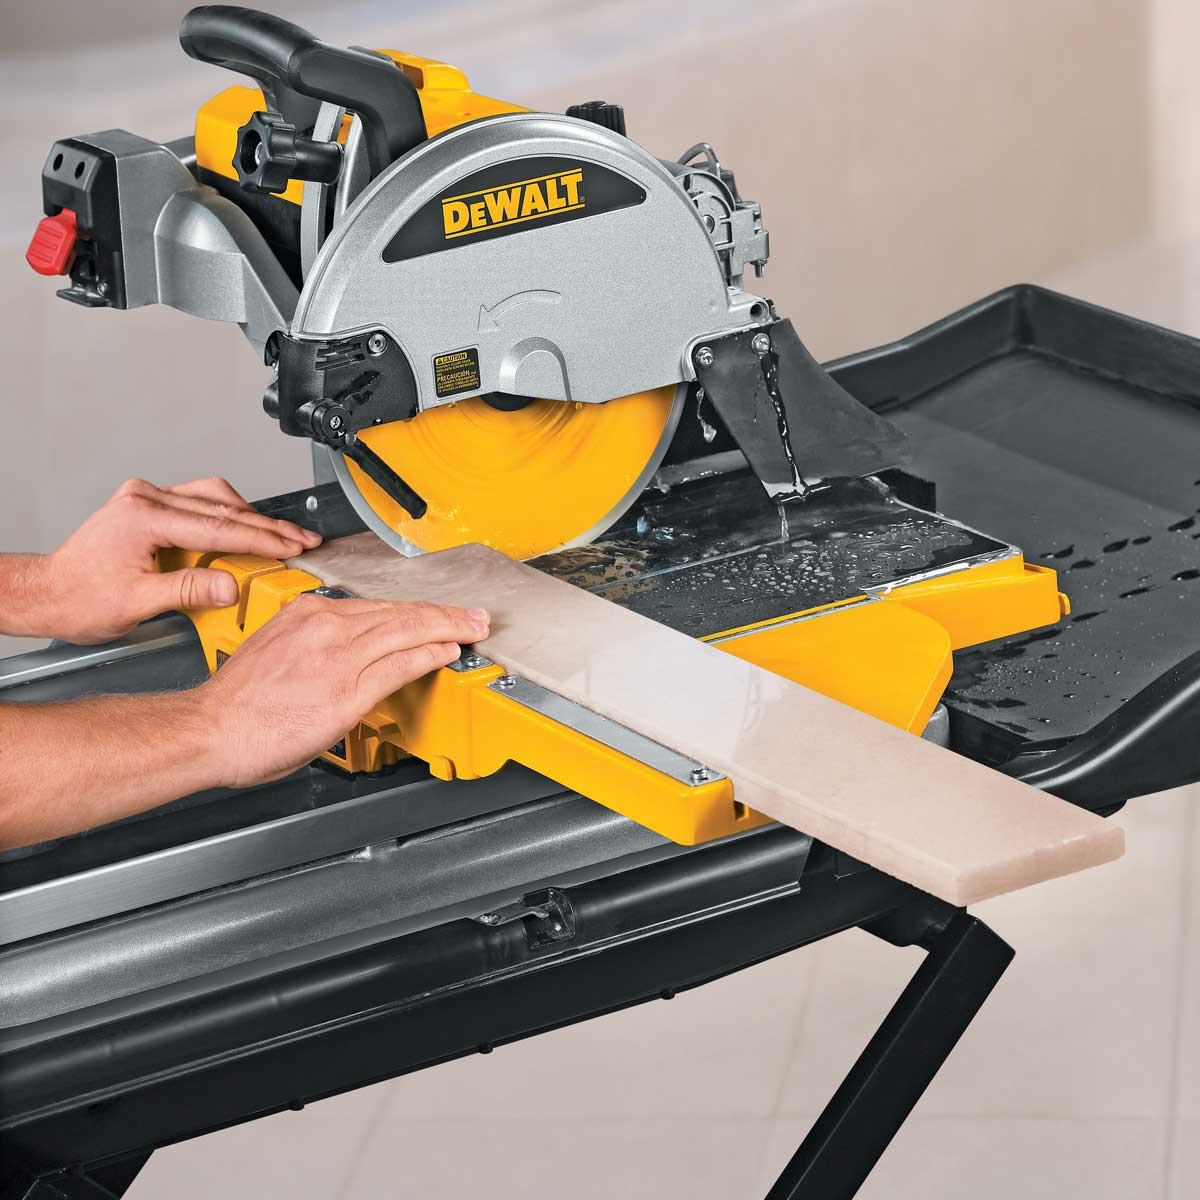 Dewalt D24000 cutting floor tile